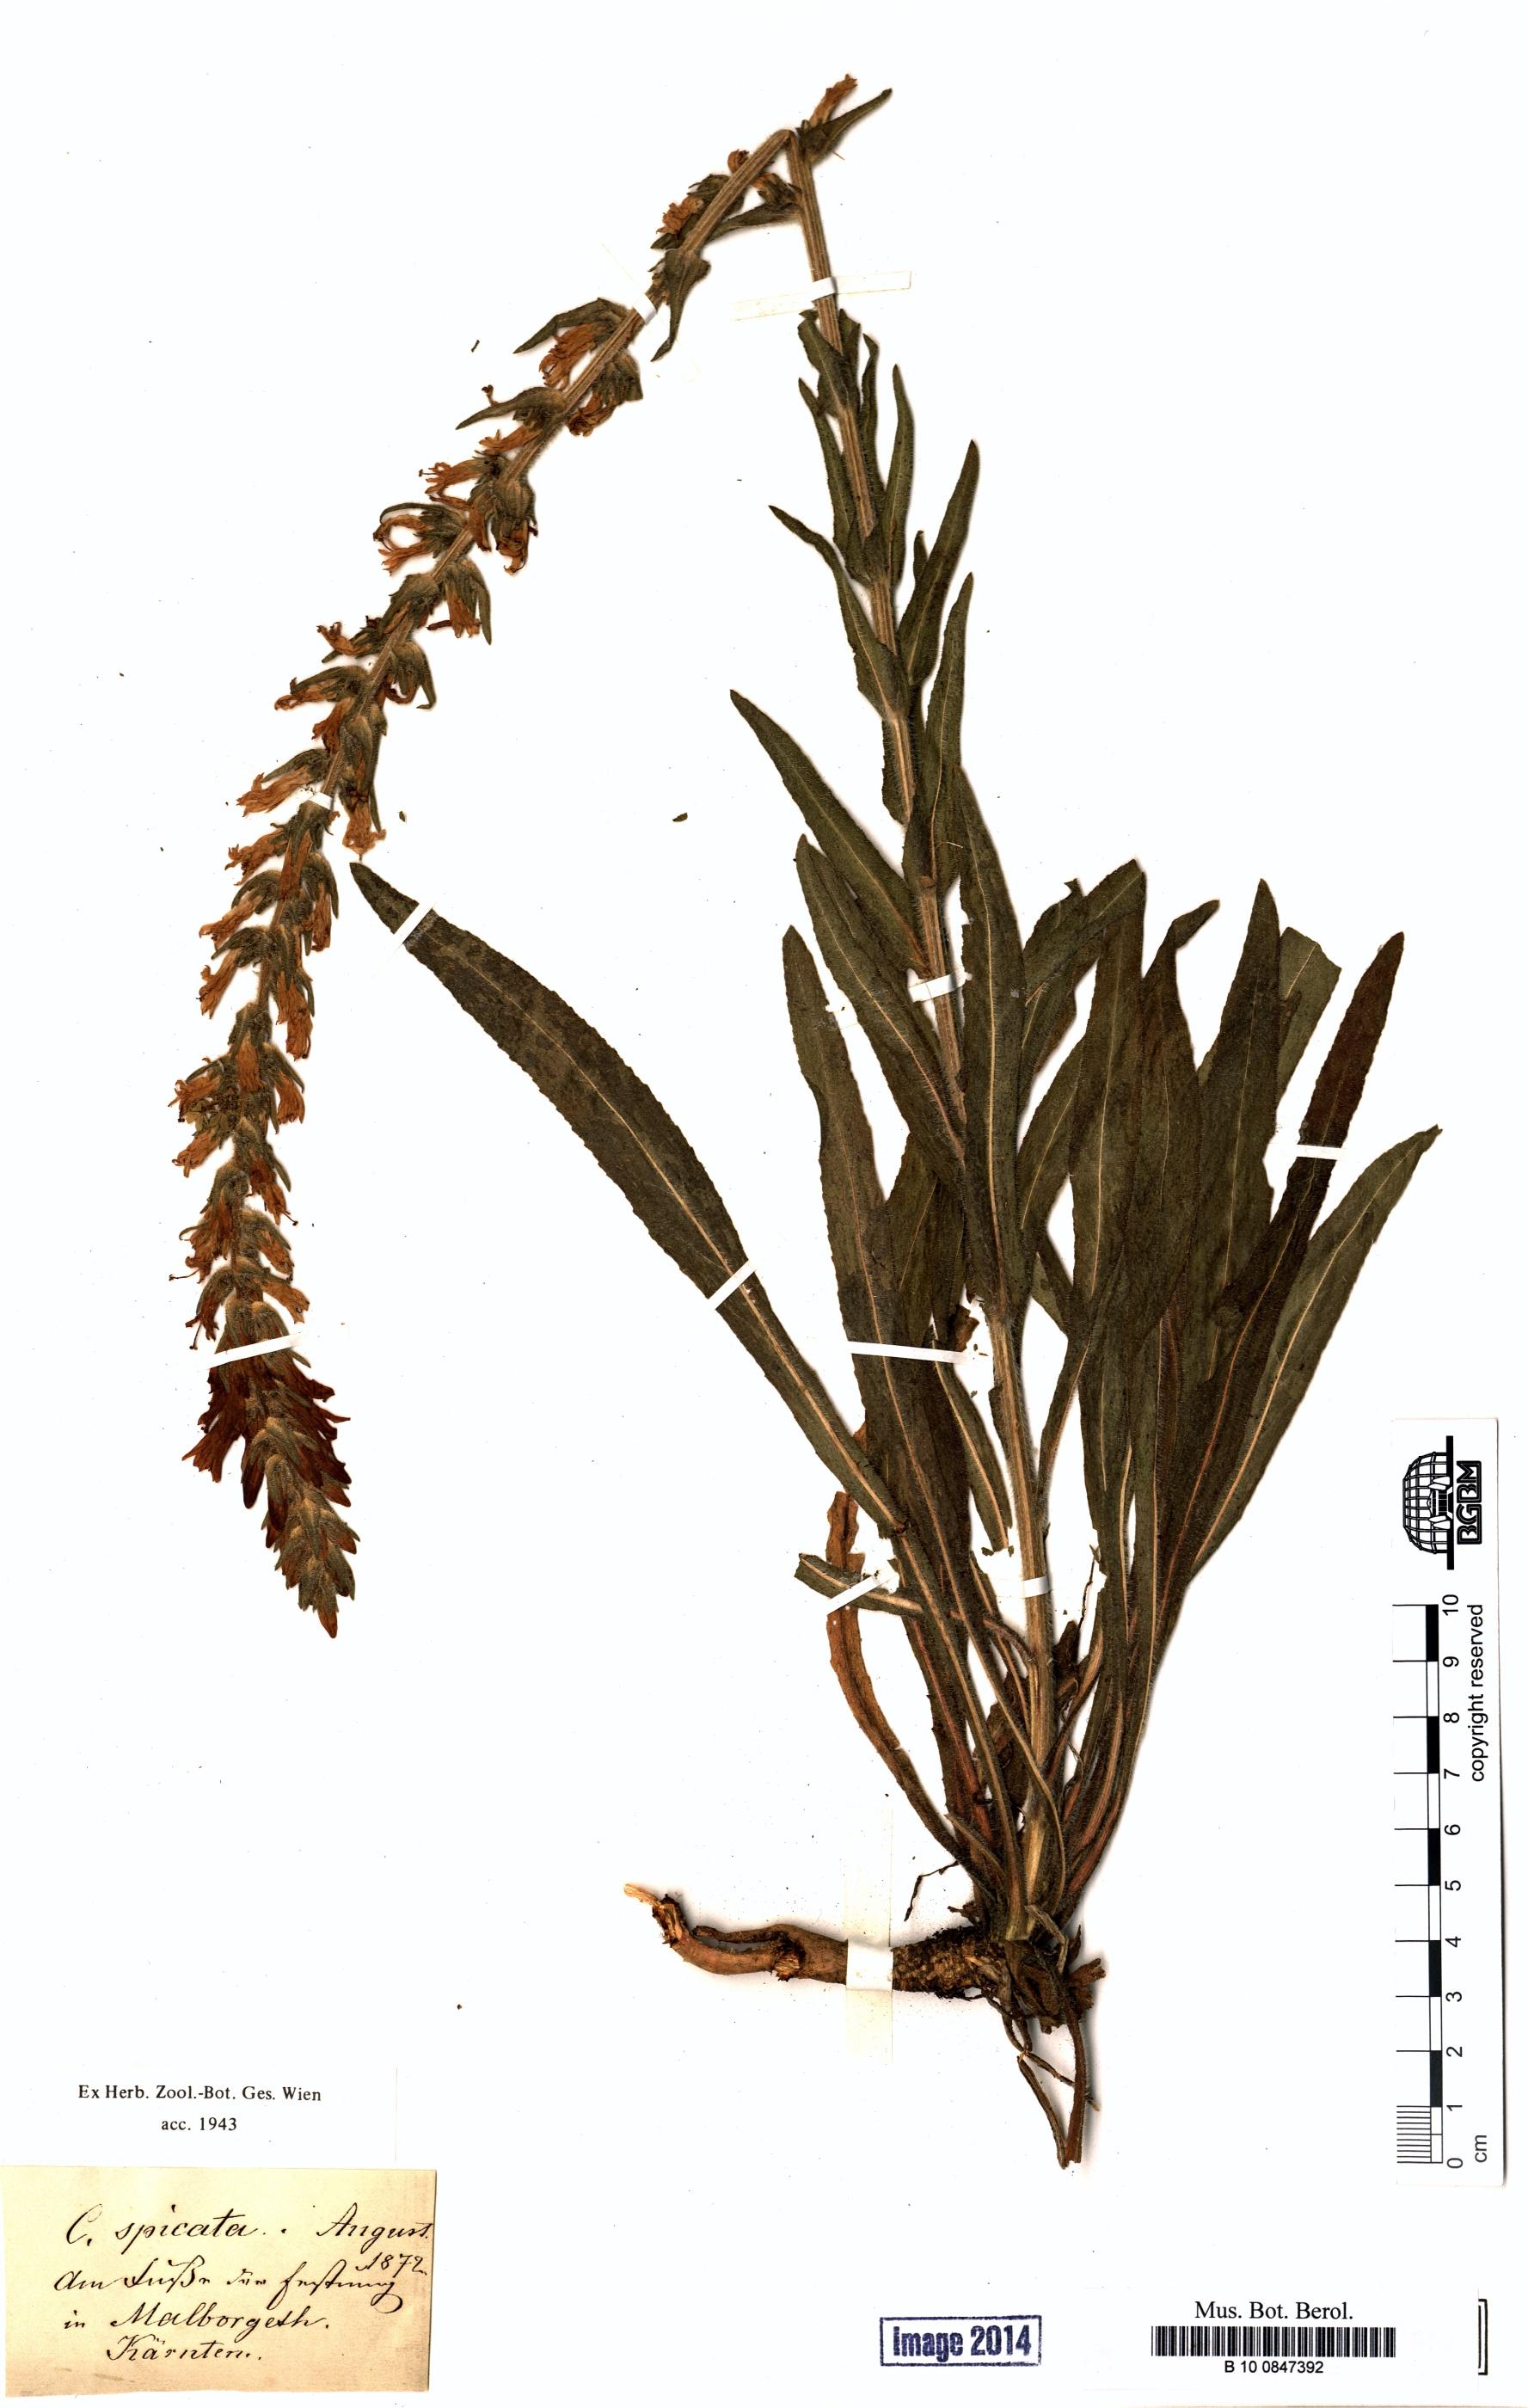 http://ww2.bgbm.org/herbarium/images/B/10/08/47/39/B_10_0847392.jpg